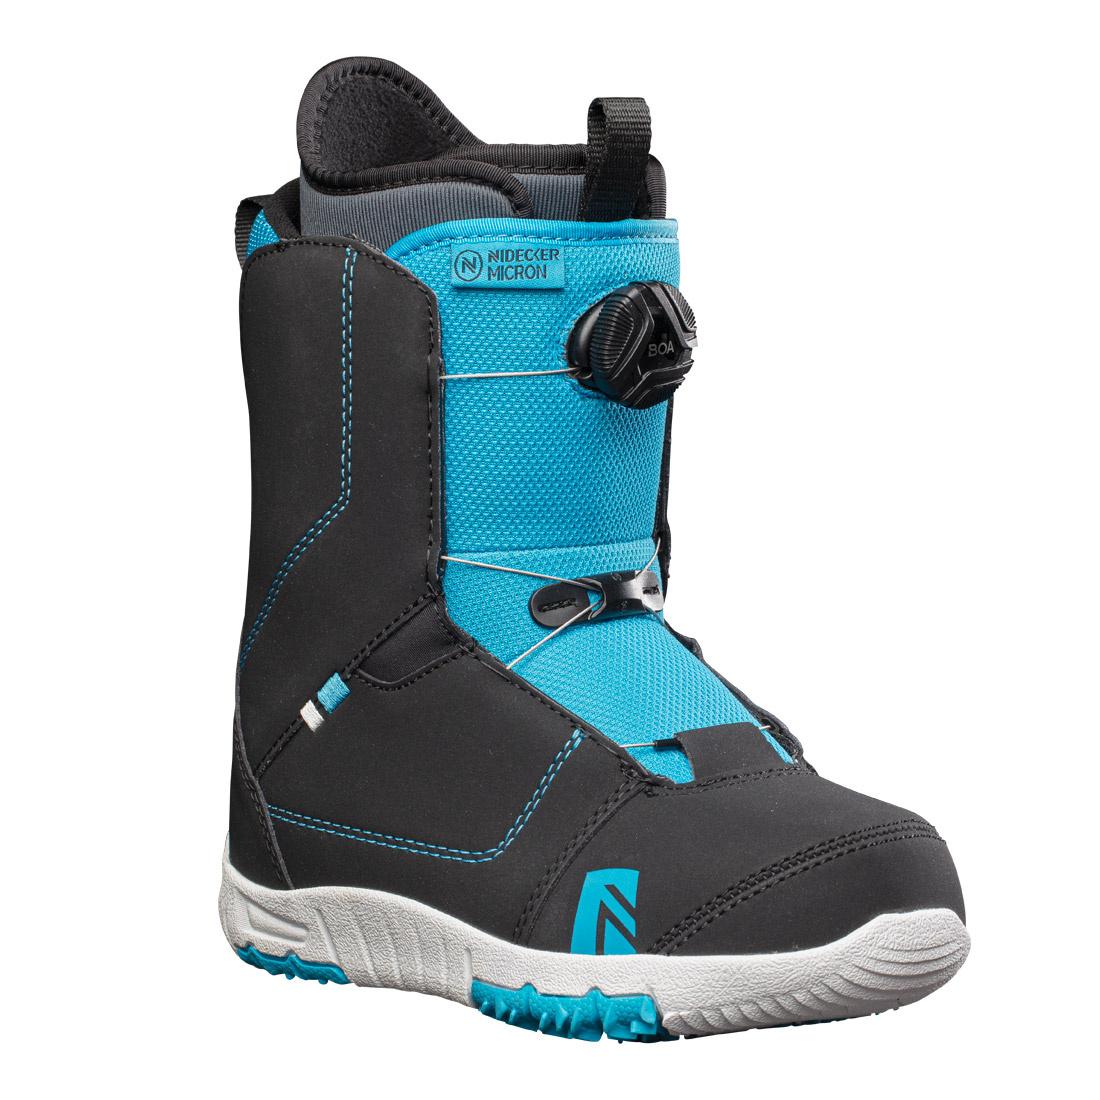 Boots snowboard Copii Nidecker Micron Negru/Albastru 20/21 imagine